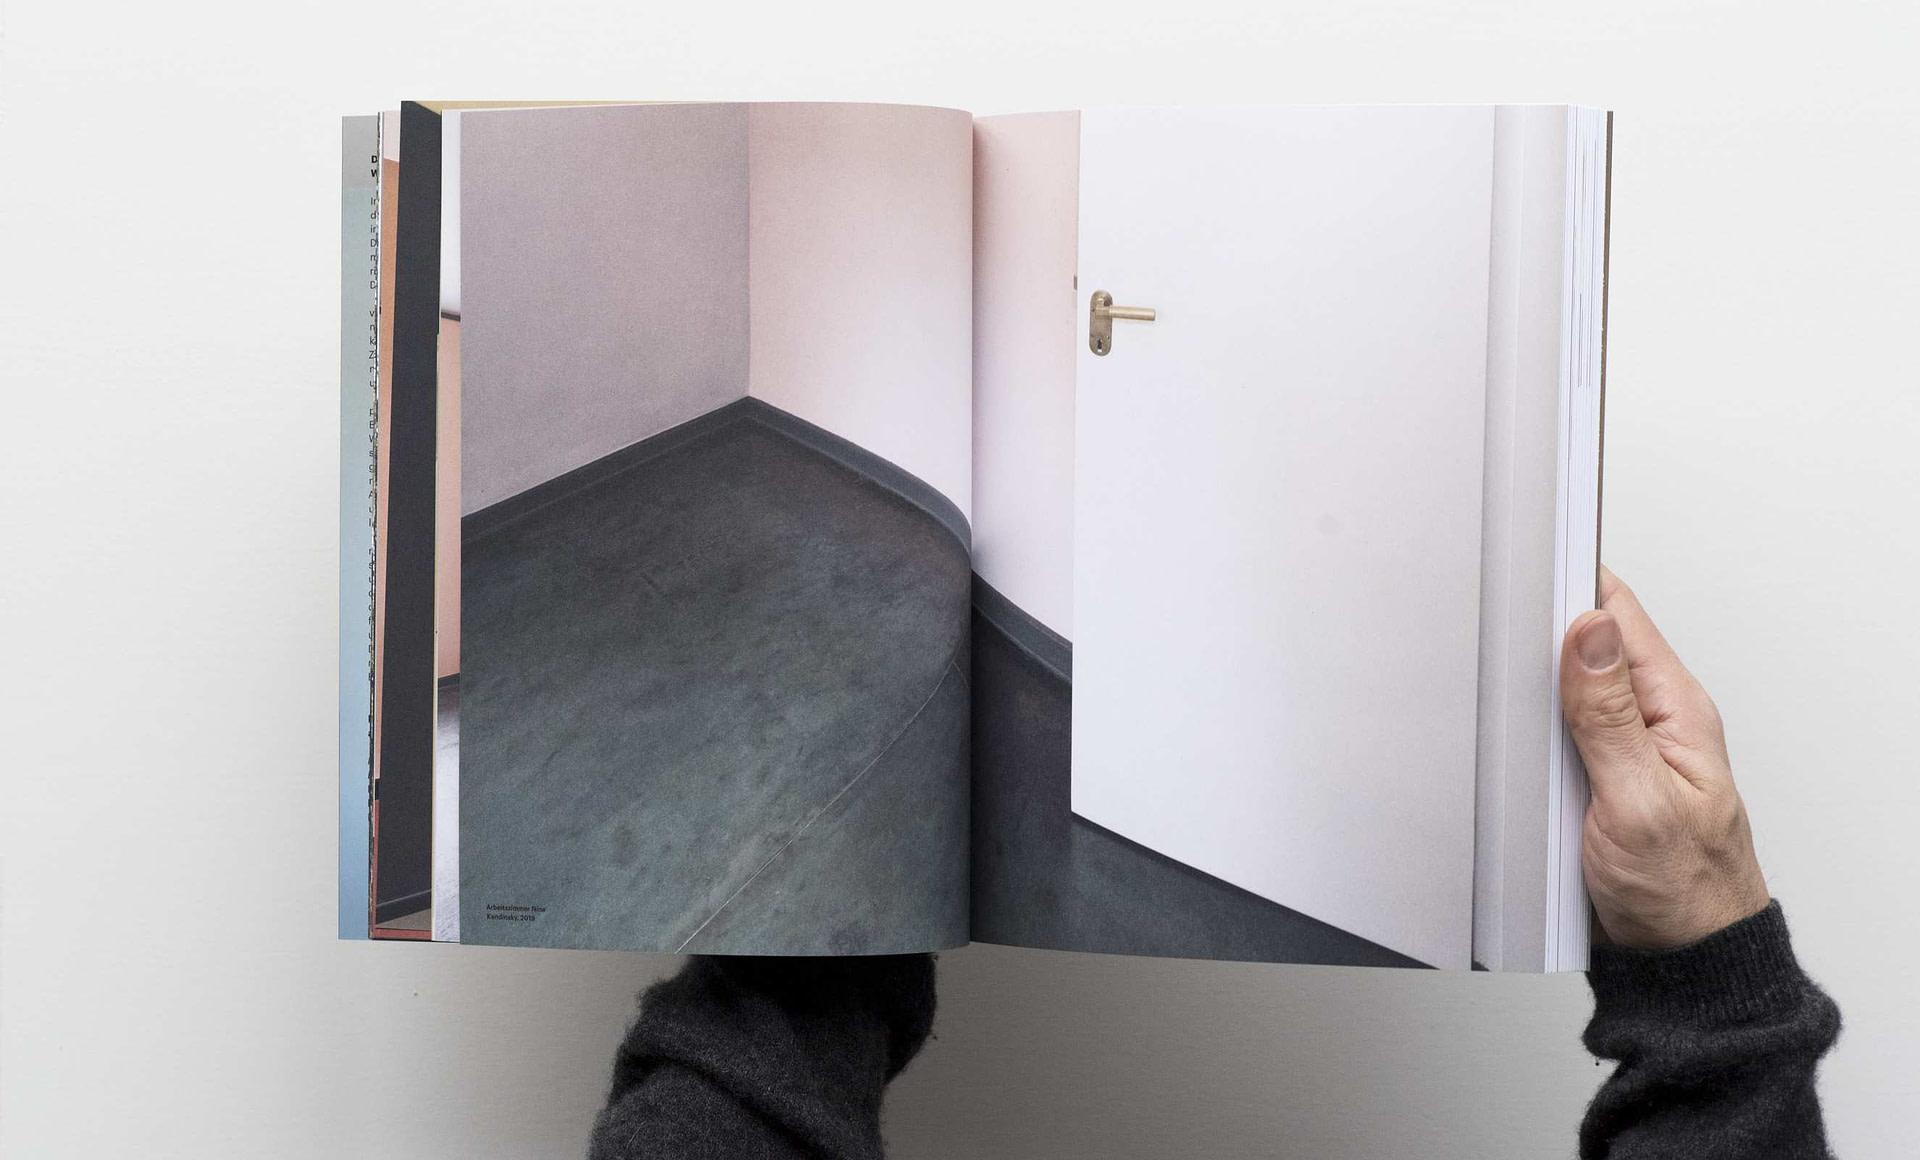 meisterhaus-kandinsky-klee-book-4-2650x1600px